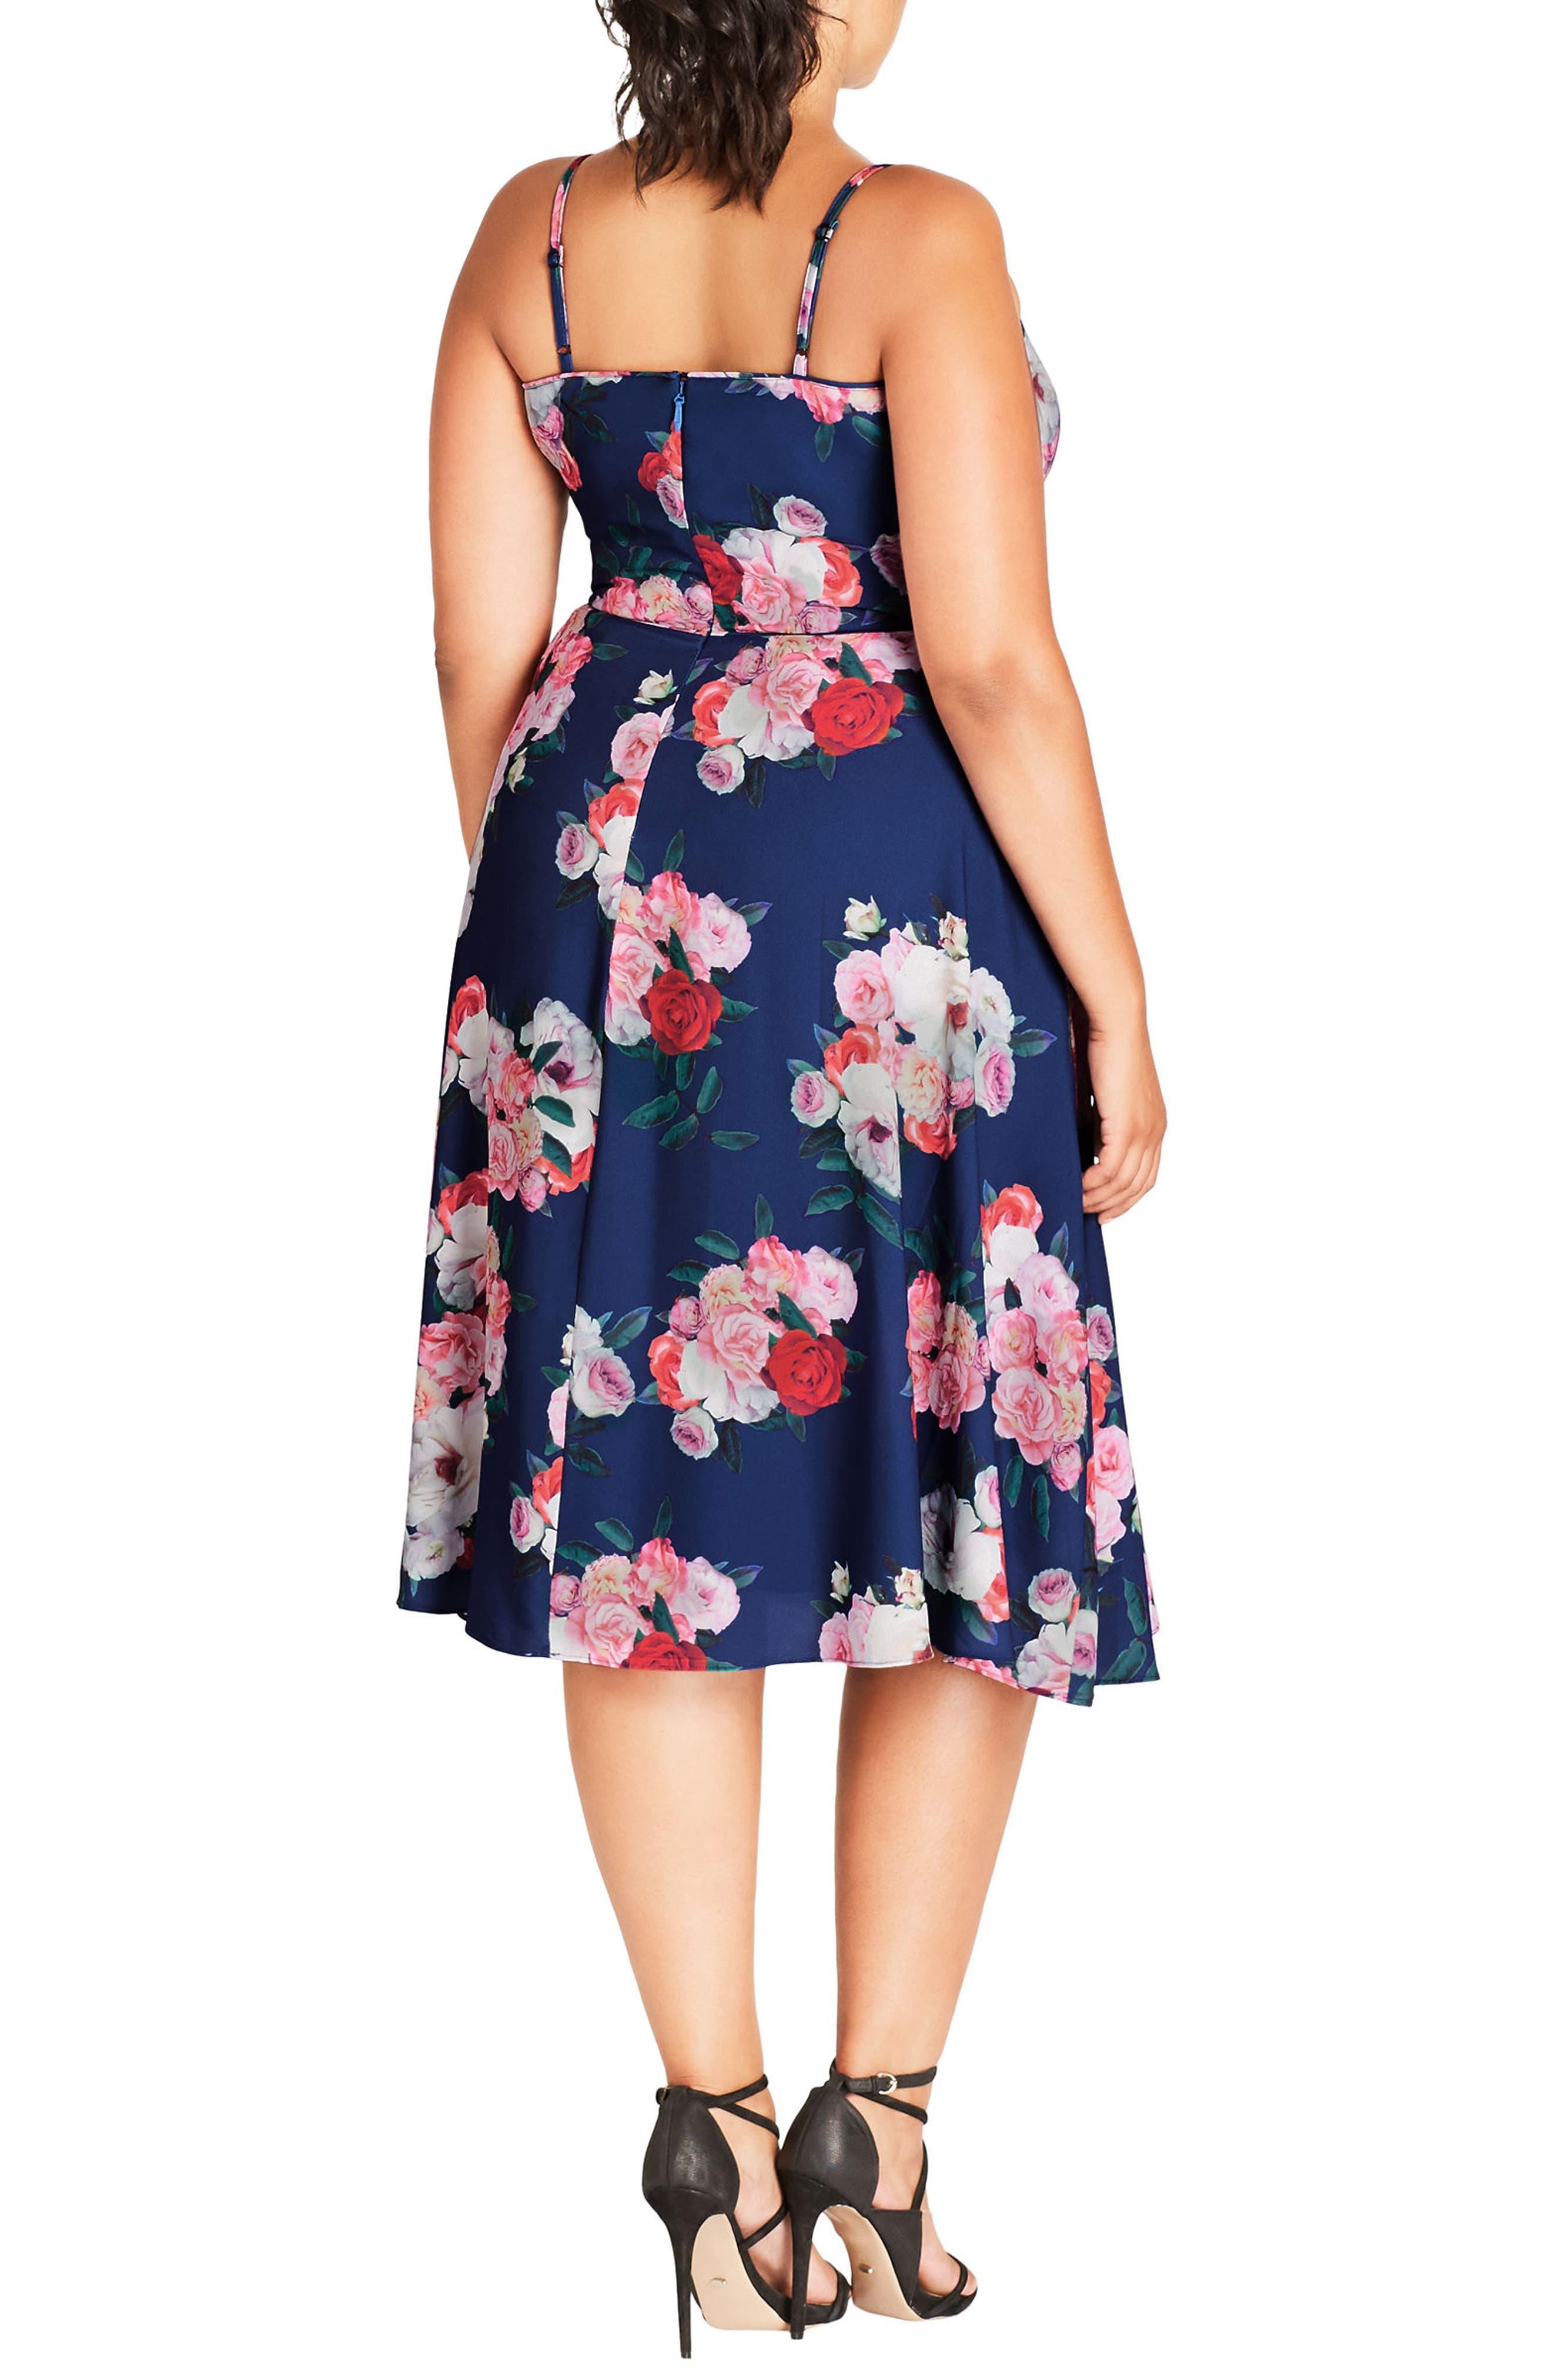 Summer Fling Floral Print Midi Dress,                             Alternate thumbnail 2, color,                             400